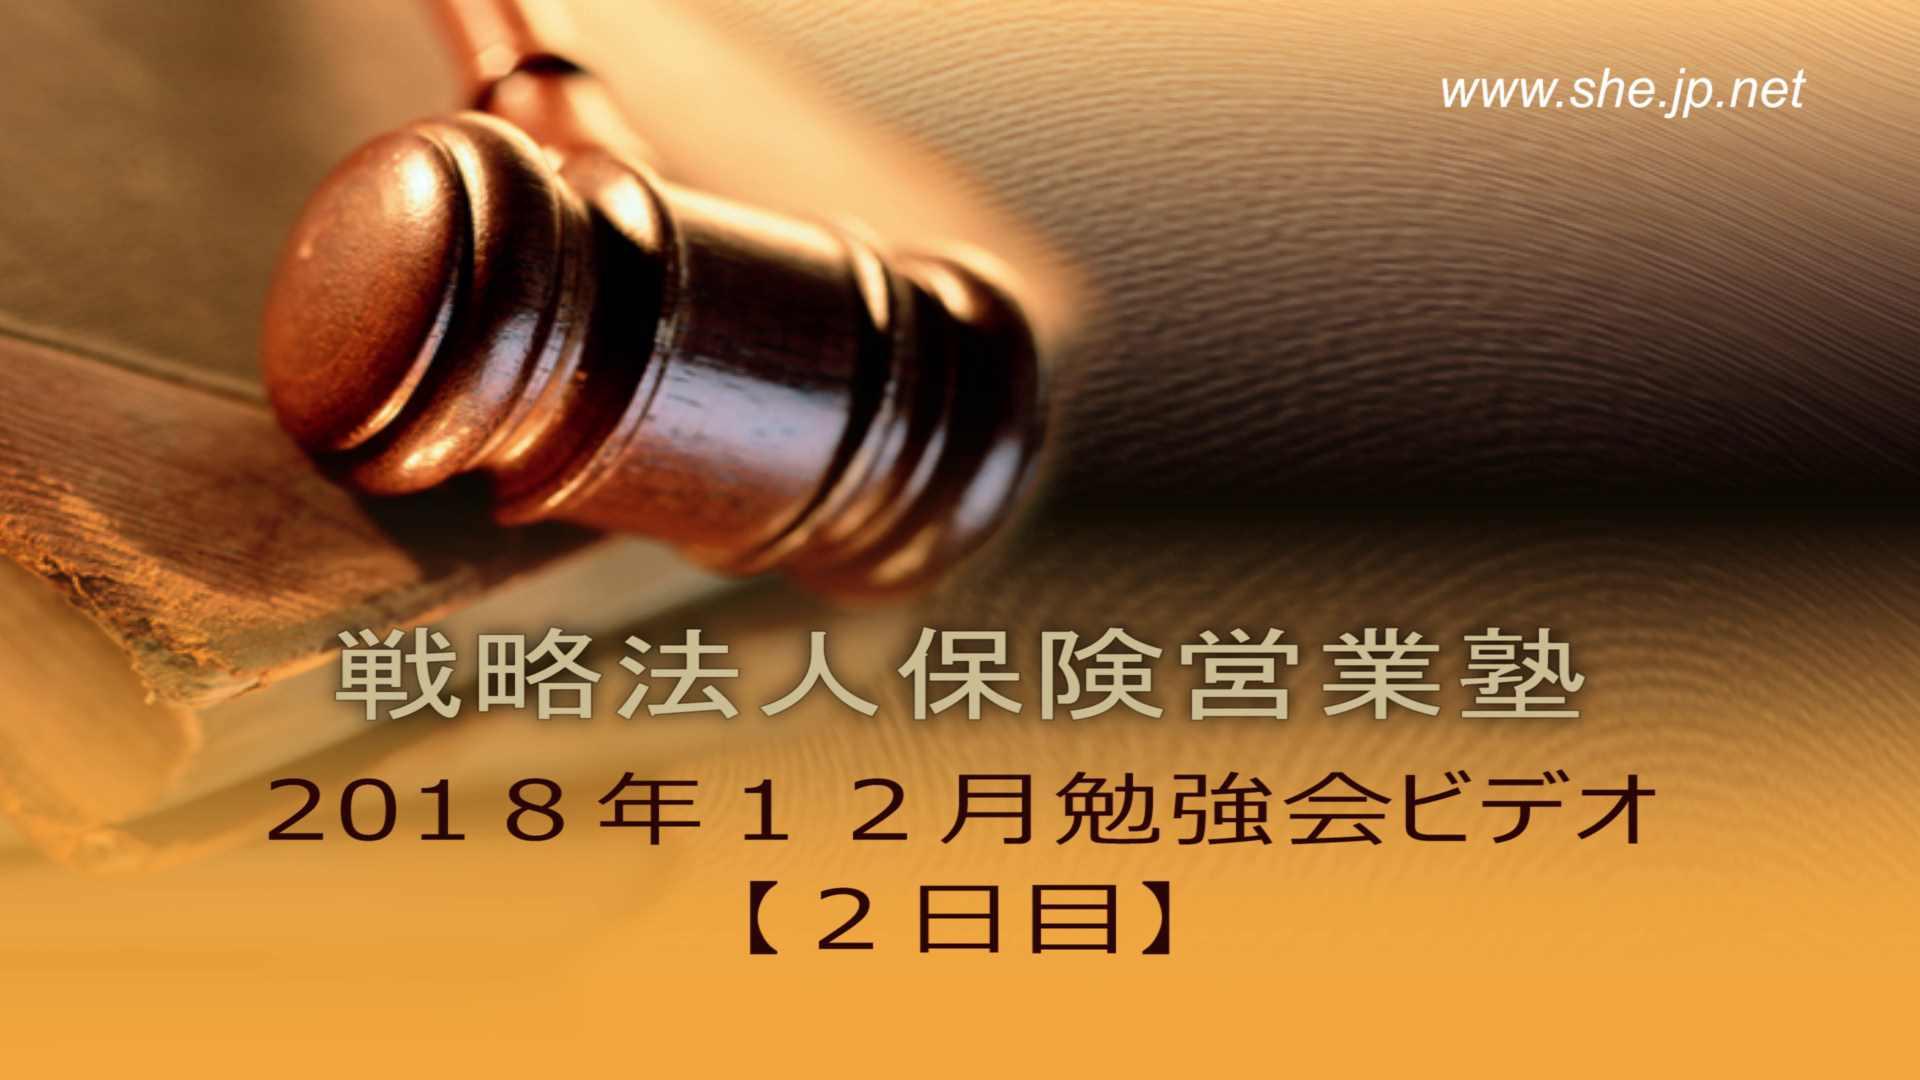 【受講者専用】 2018年12月度_2日目LiveSHE勉強会ビデオ(メンバー限定)